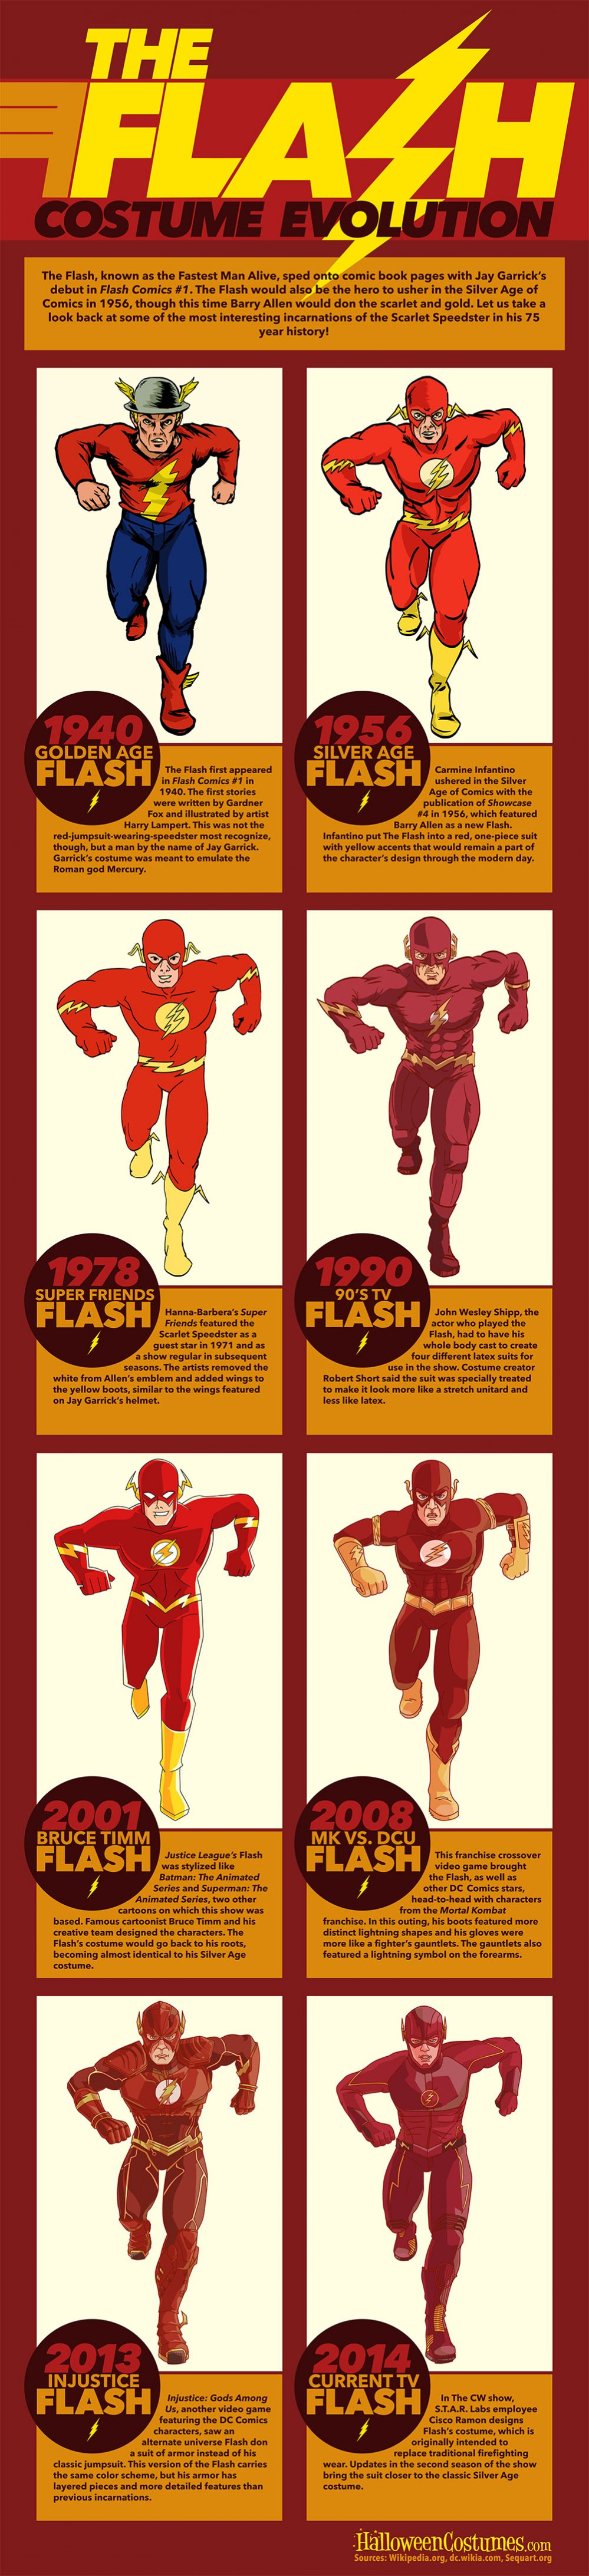 Flash-Evolution-Infographic